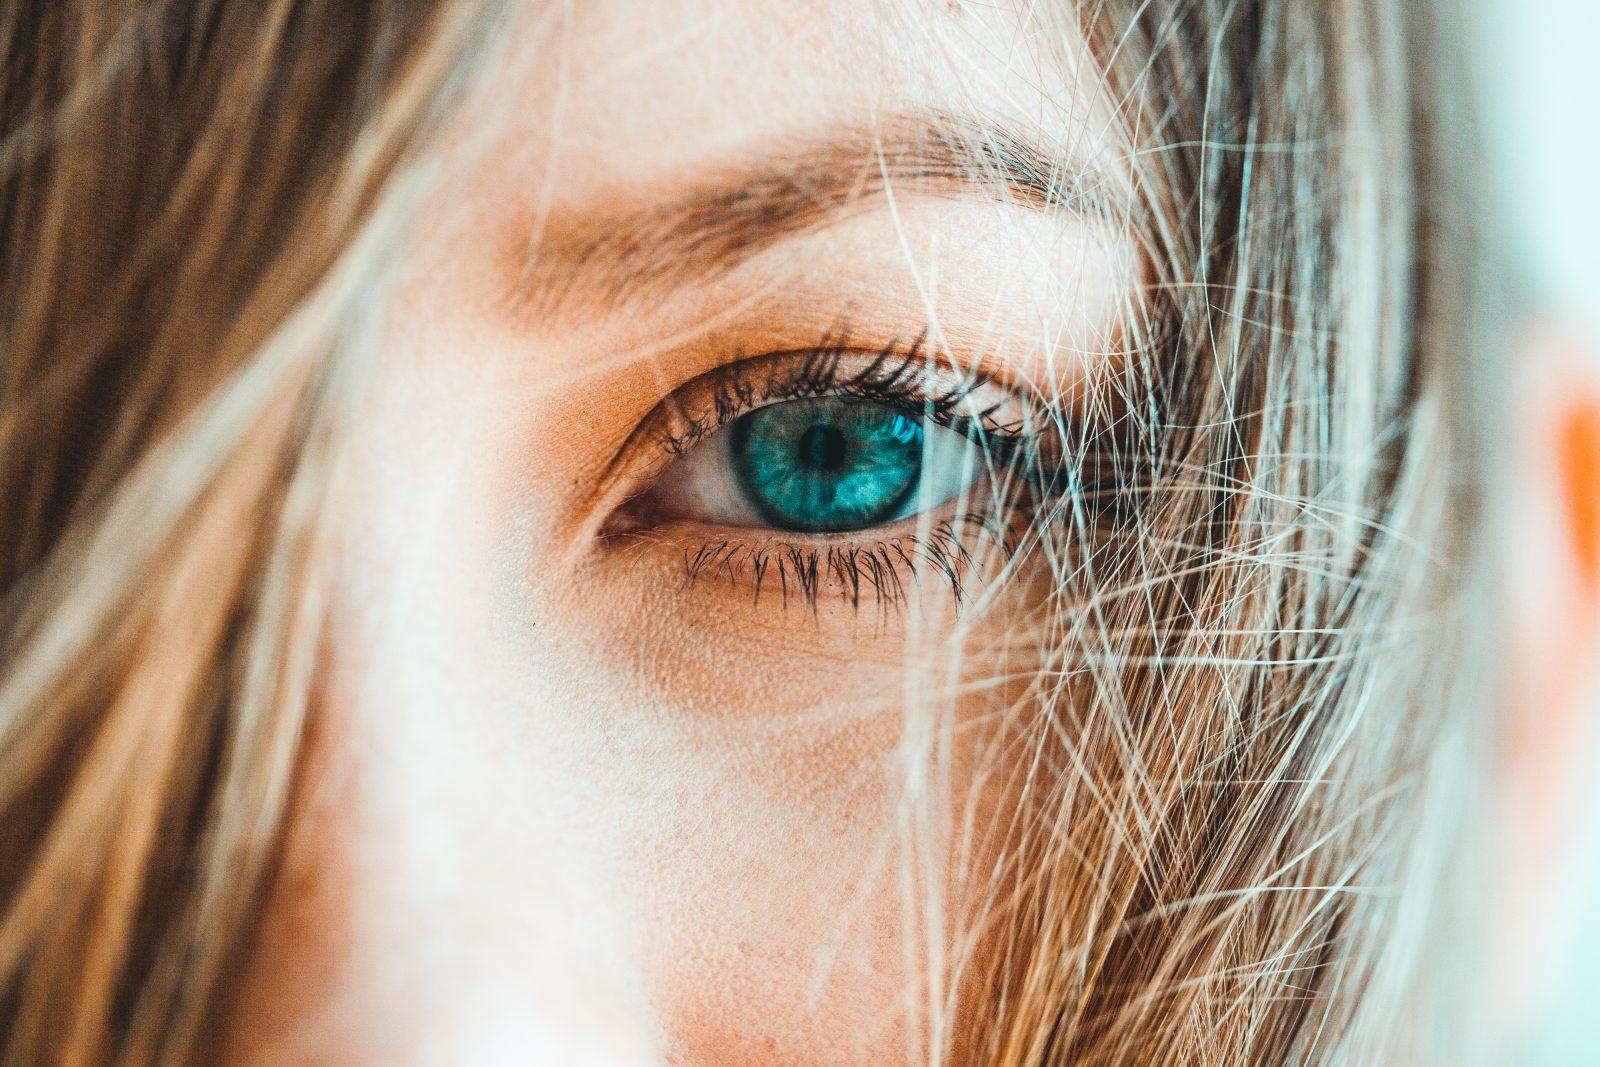 Blue eye details